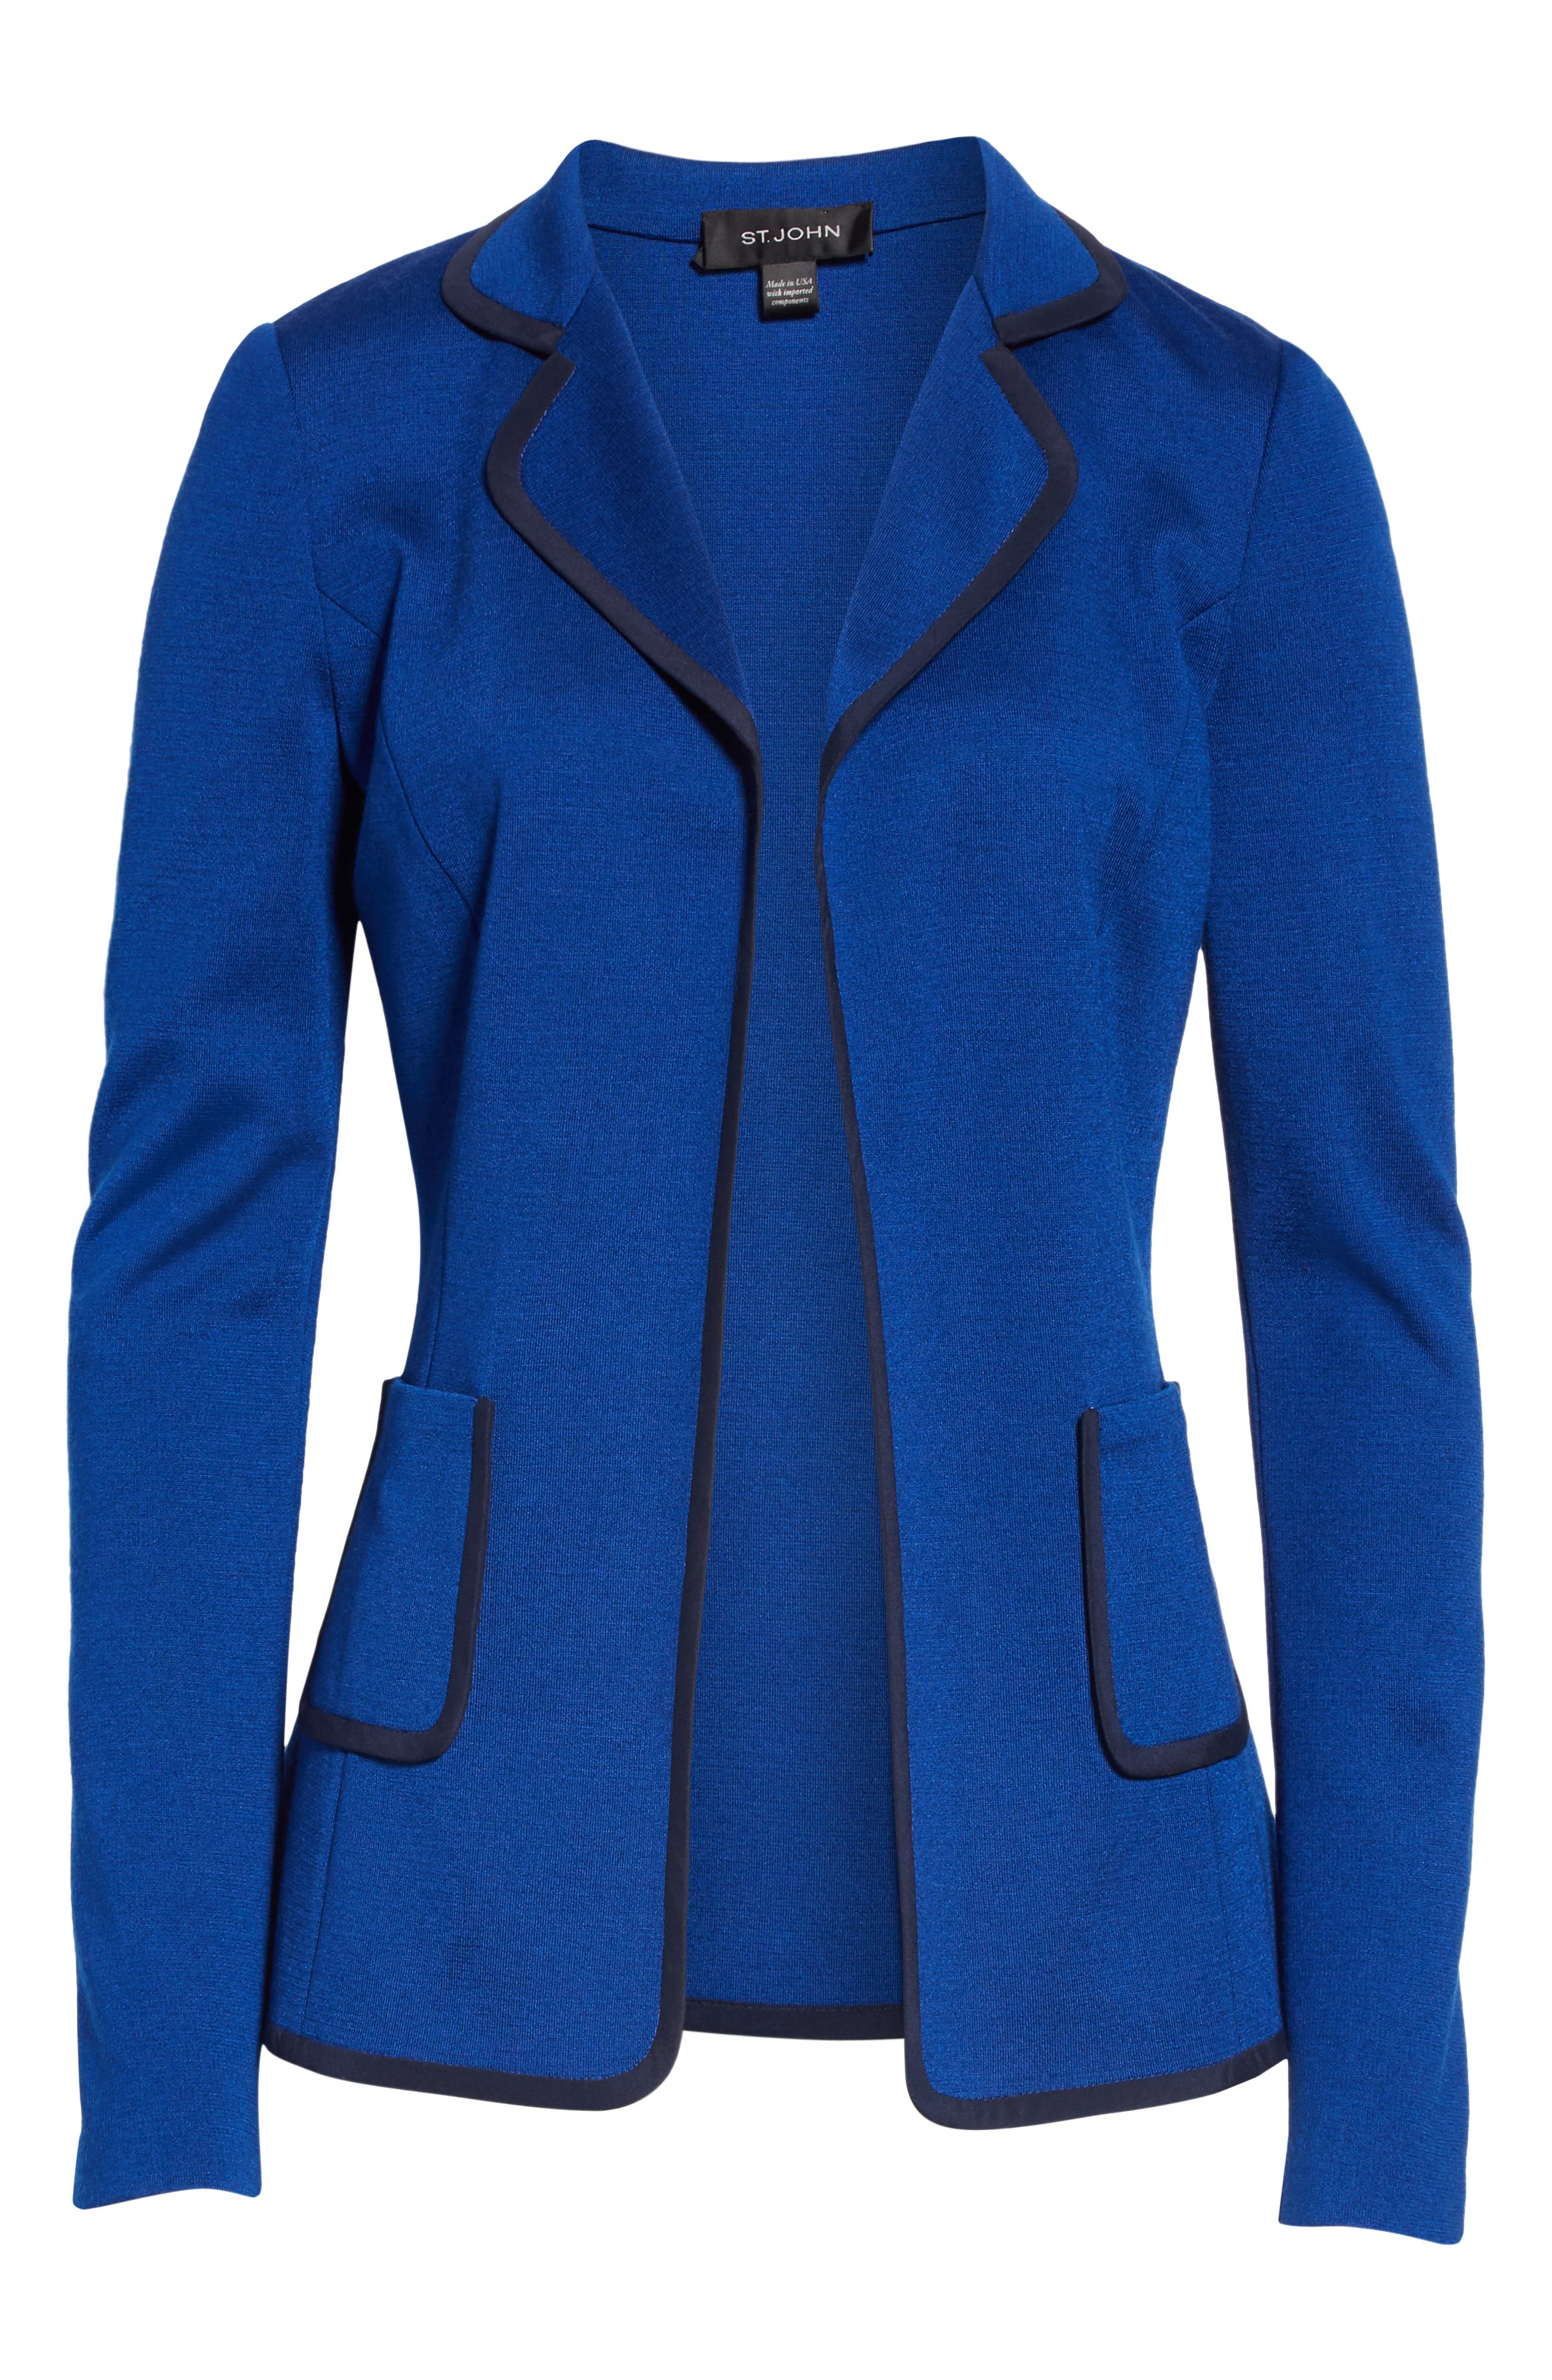 ST. JOHN COLLECTION, Patch Pocket Milano Knit Jacket, Alternate thumbnail 6, color, AZUL/ NAVY